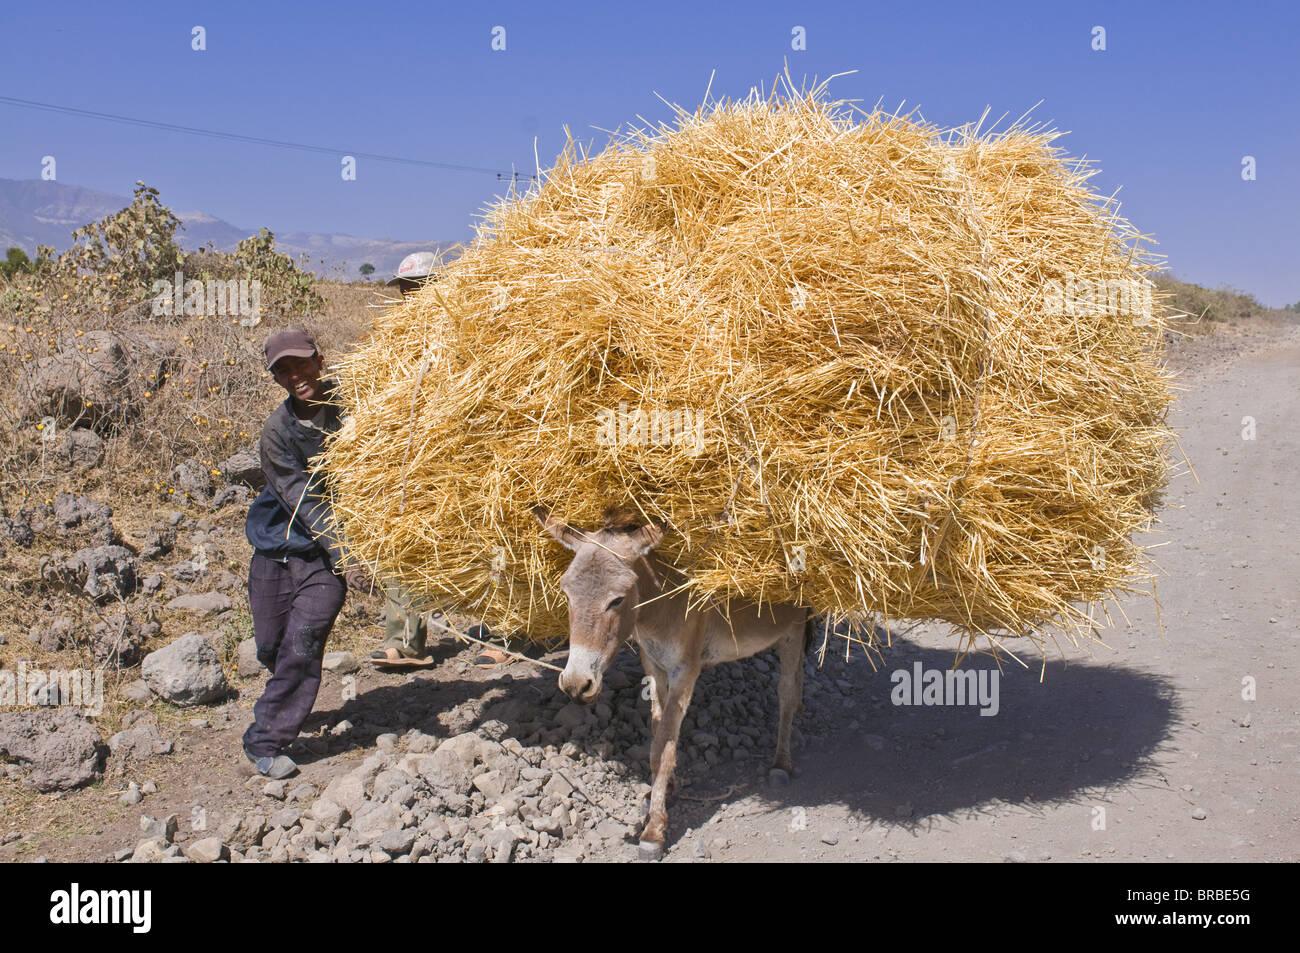 Donkey loaded with hay, Eastern Ethiopia - Stock Image